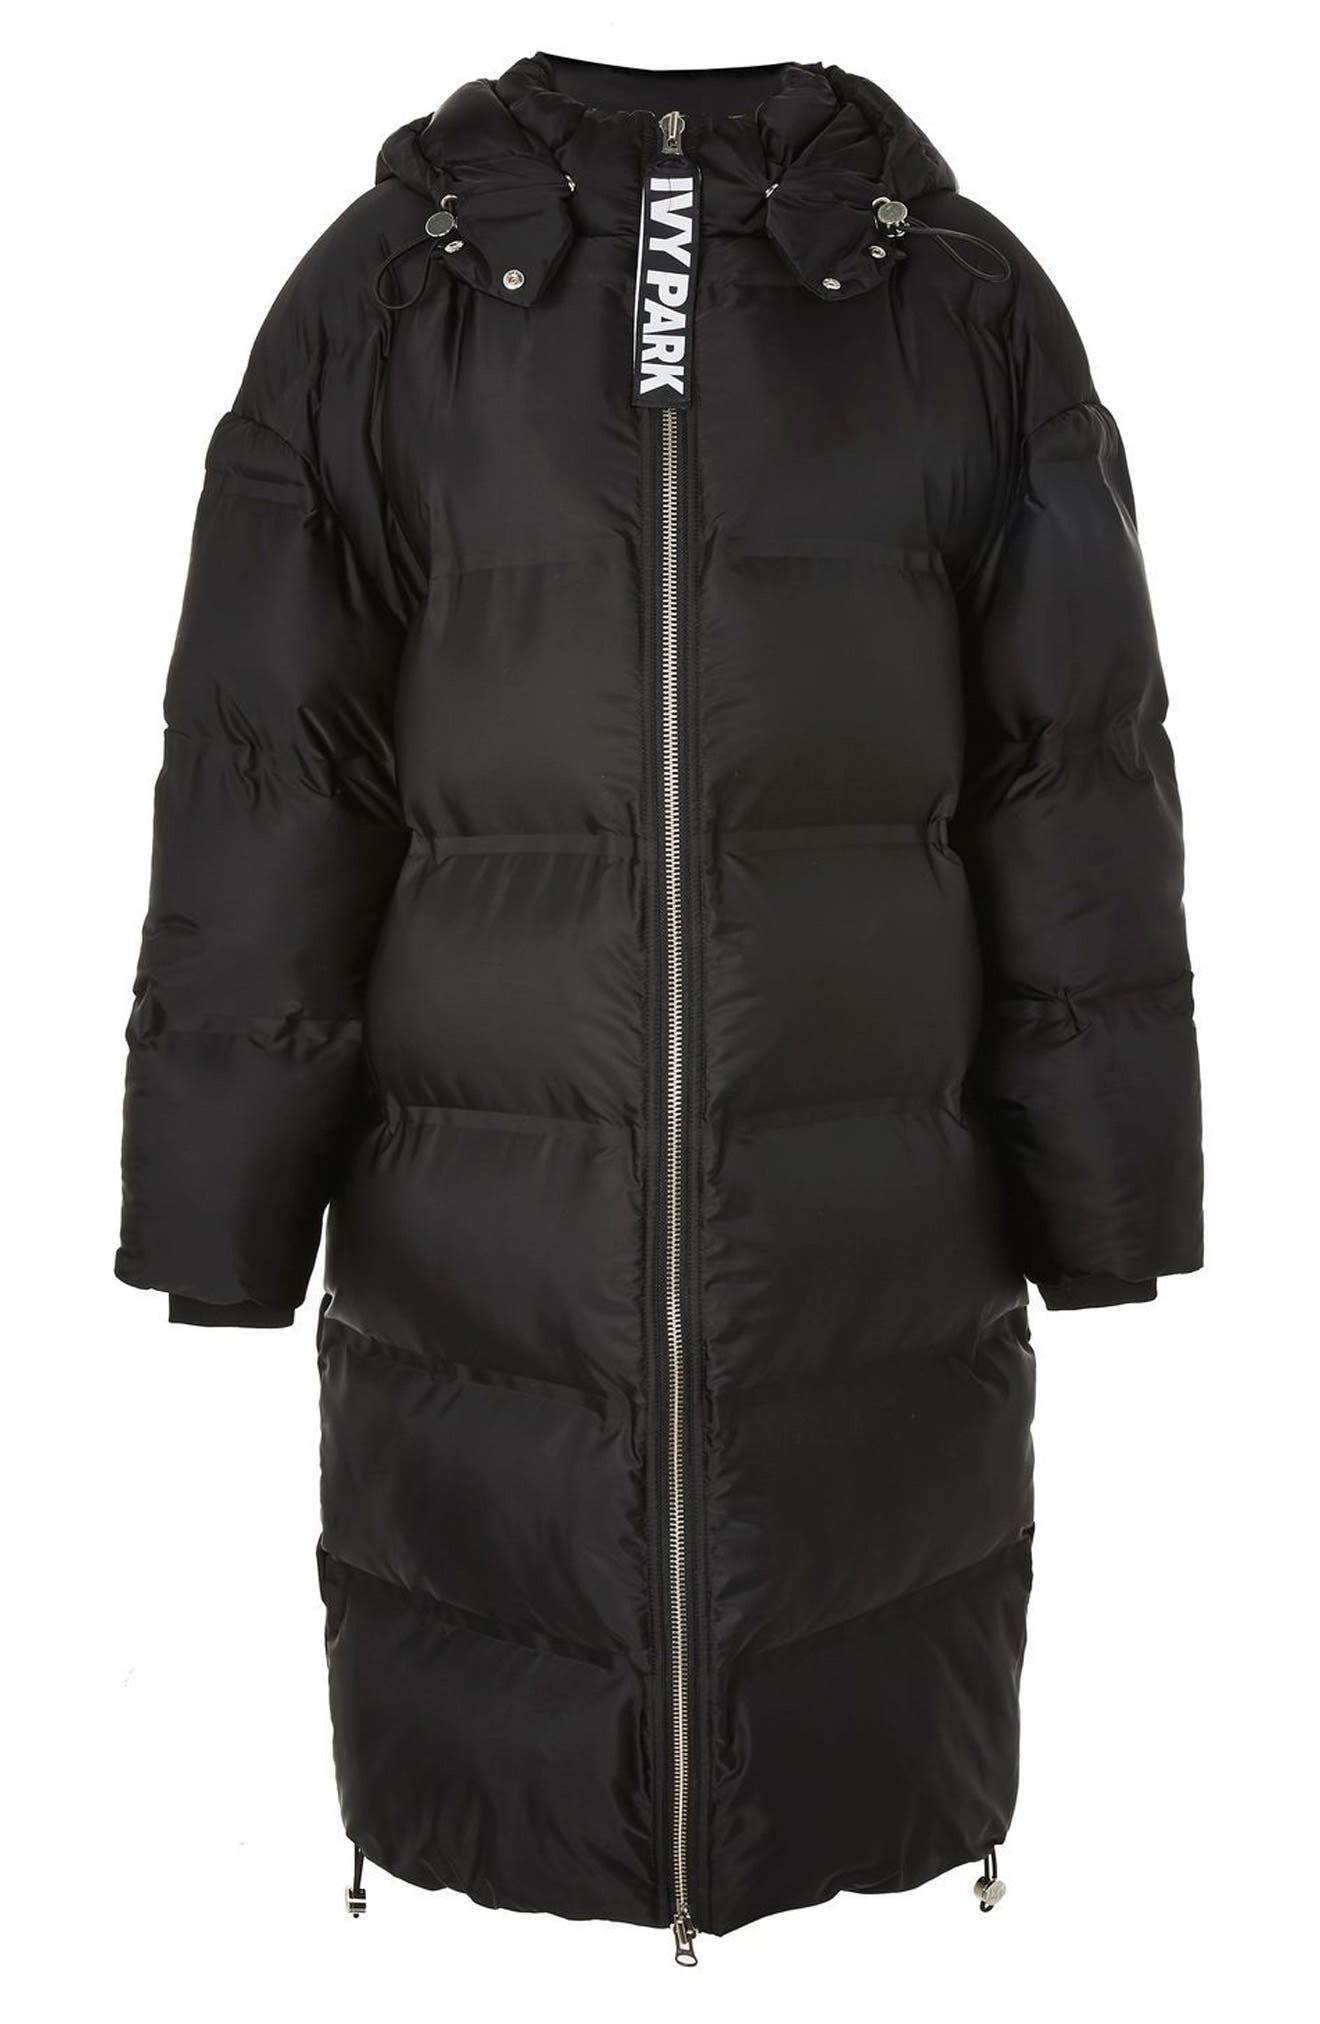 Main Image - IVY PARK® Longline Bonded Puffer Jacket